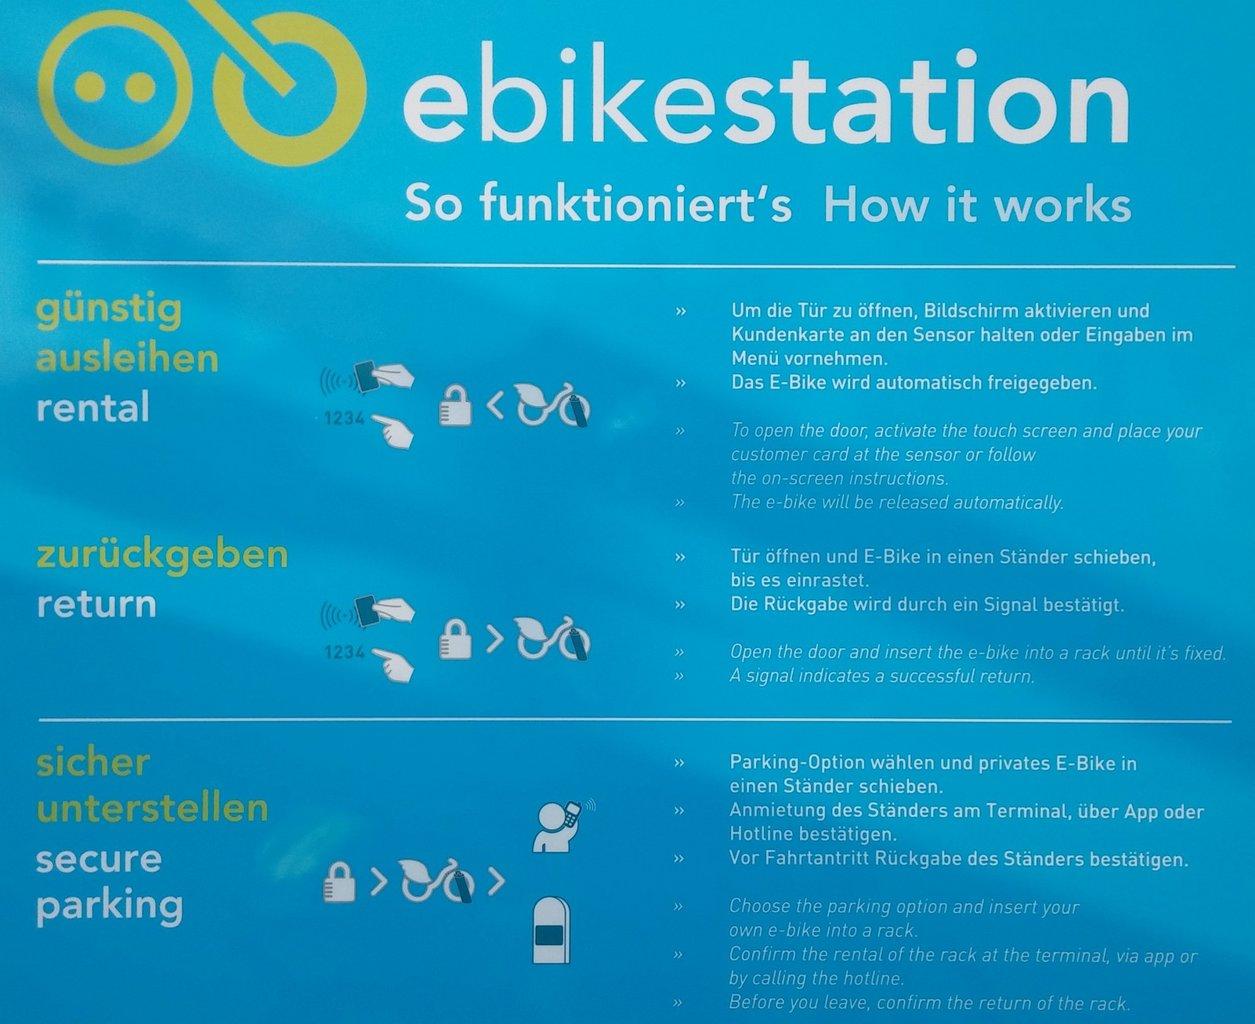 e-bike-station-20160410_181826.jpg